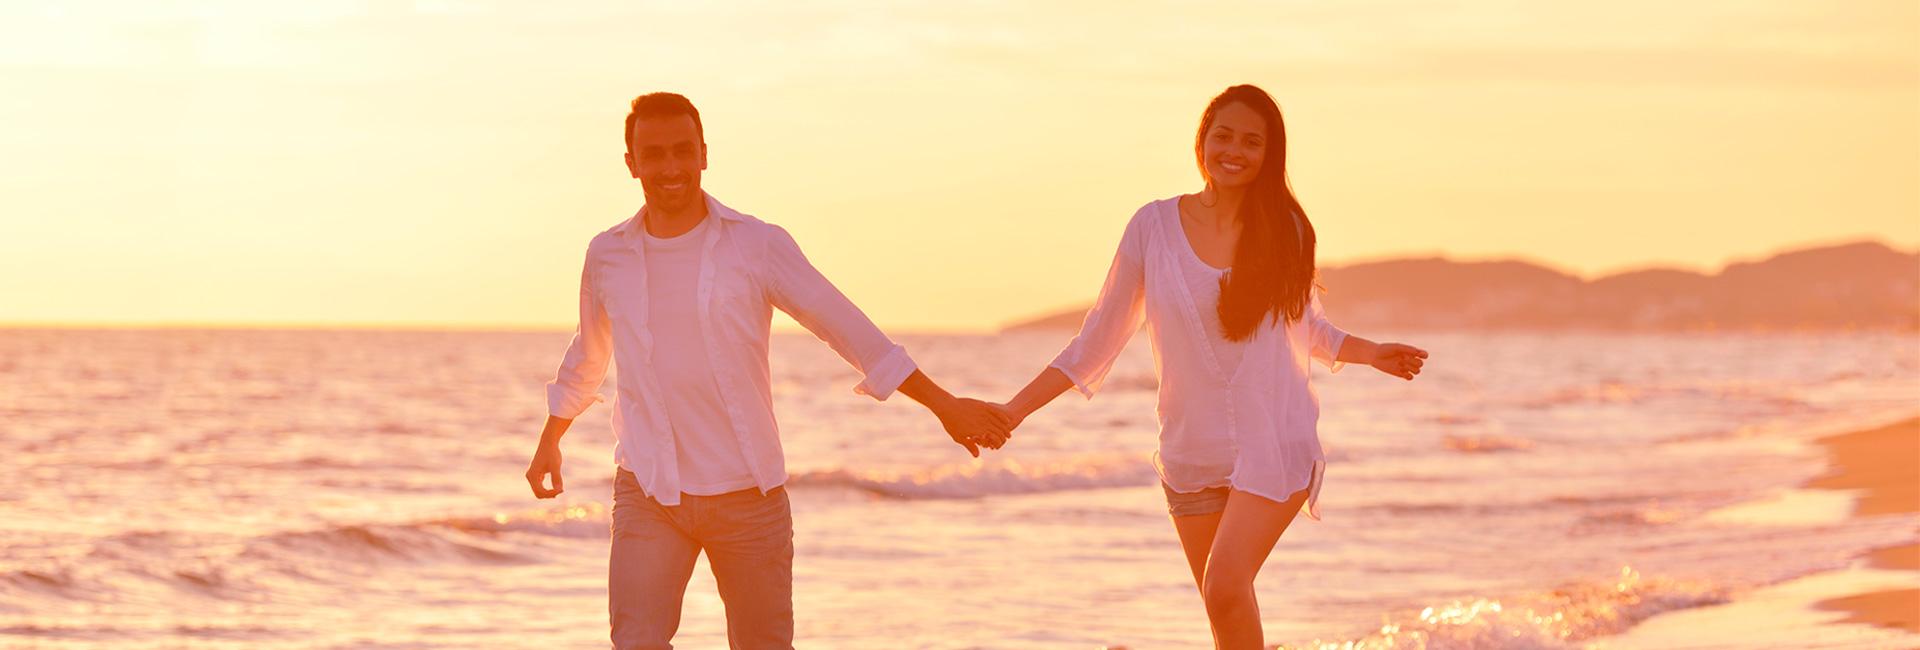 Three simple  ways to be romantic on your nuevo vallarta vacations